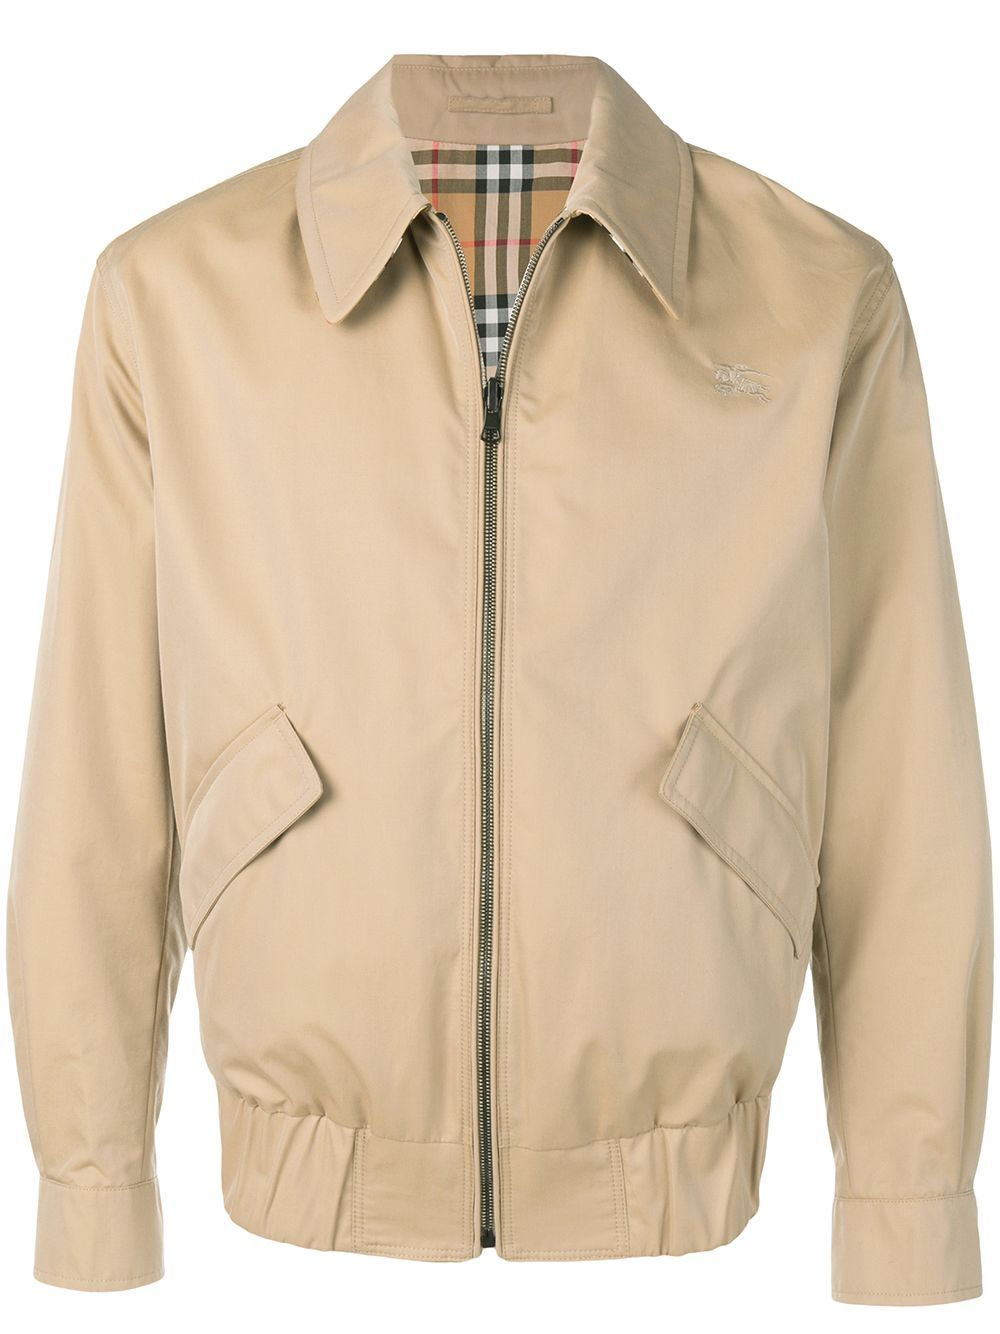 Burberry Reversible Gabardine And Check Harrington Jacket Farfetch Designer Jackets For Men Mens Jackets Harrington Jacket [ 1334 x 1000 Pixel ]